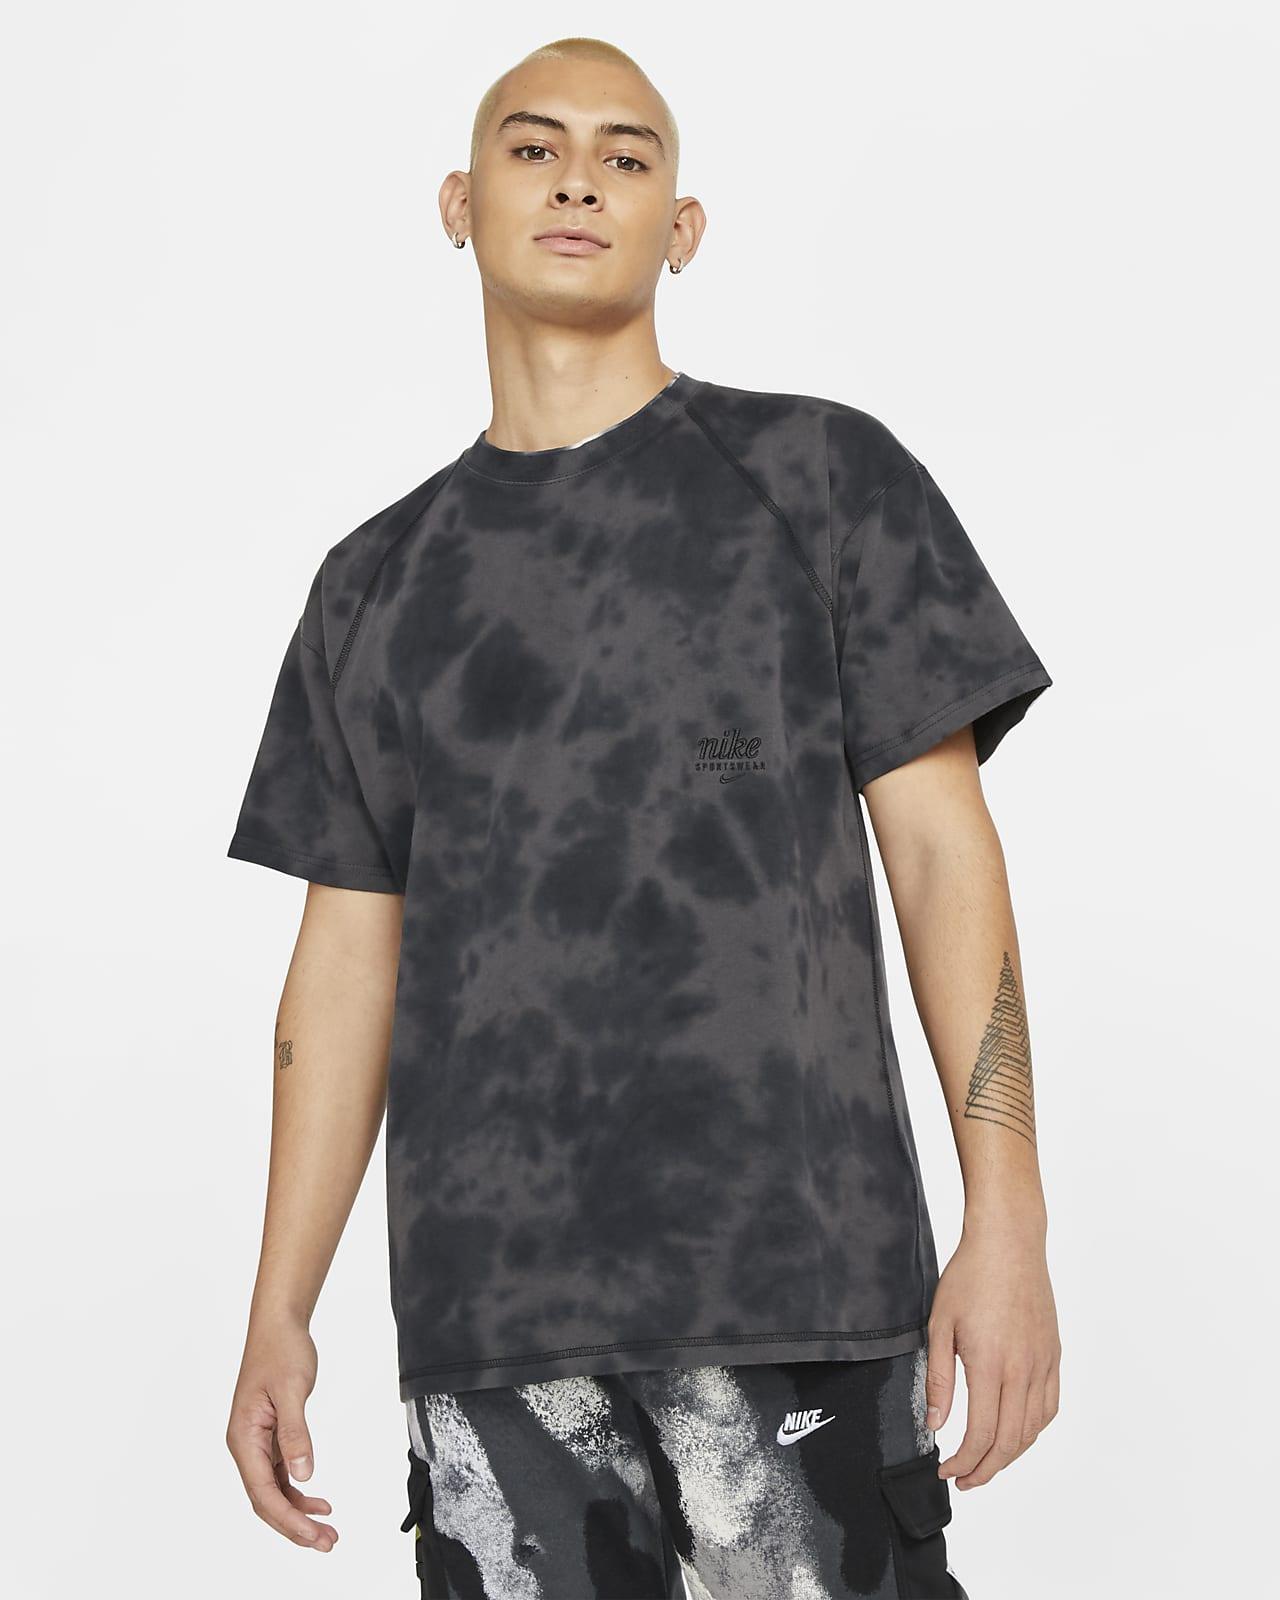 Playera Max90 para hombre Nike Sportswear